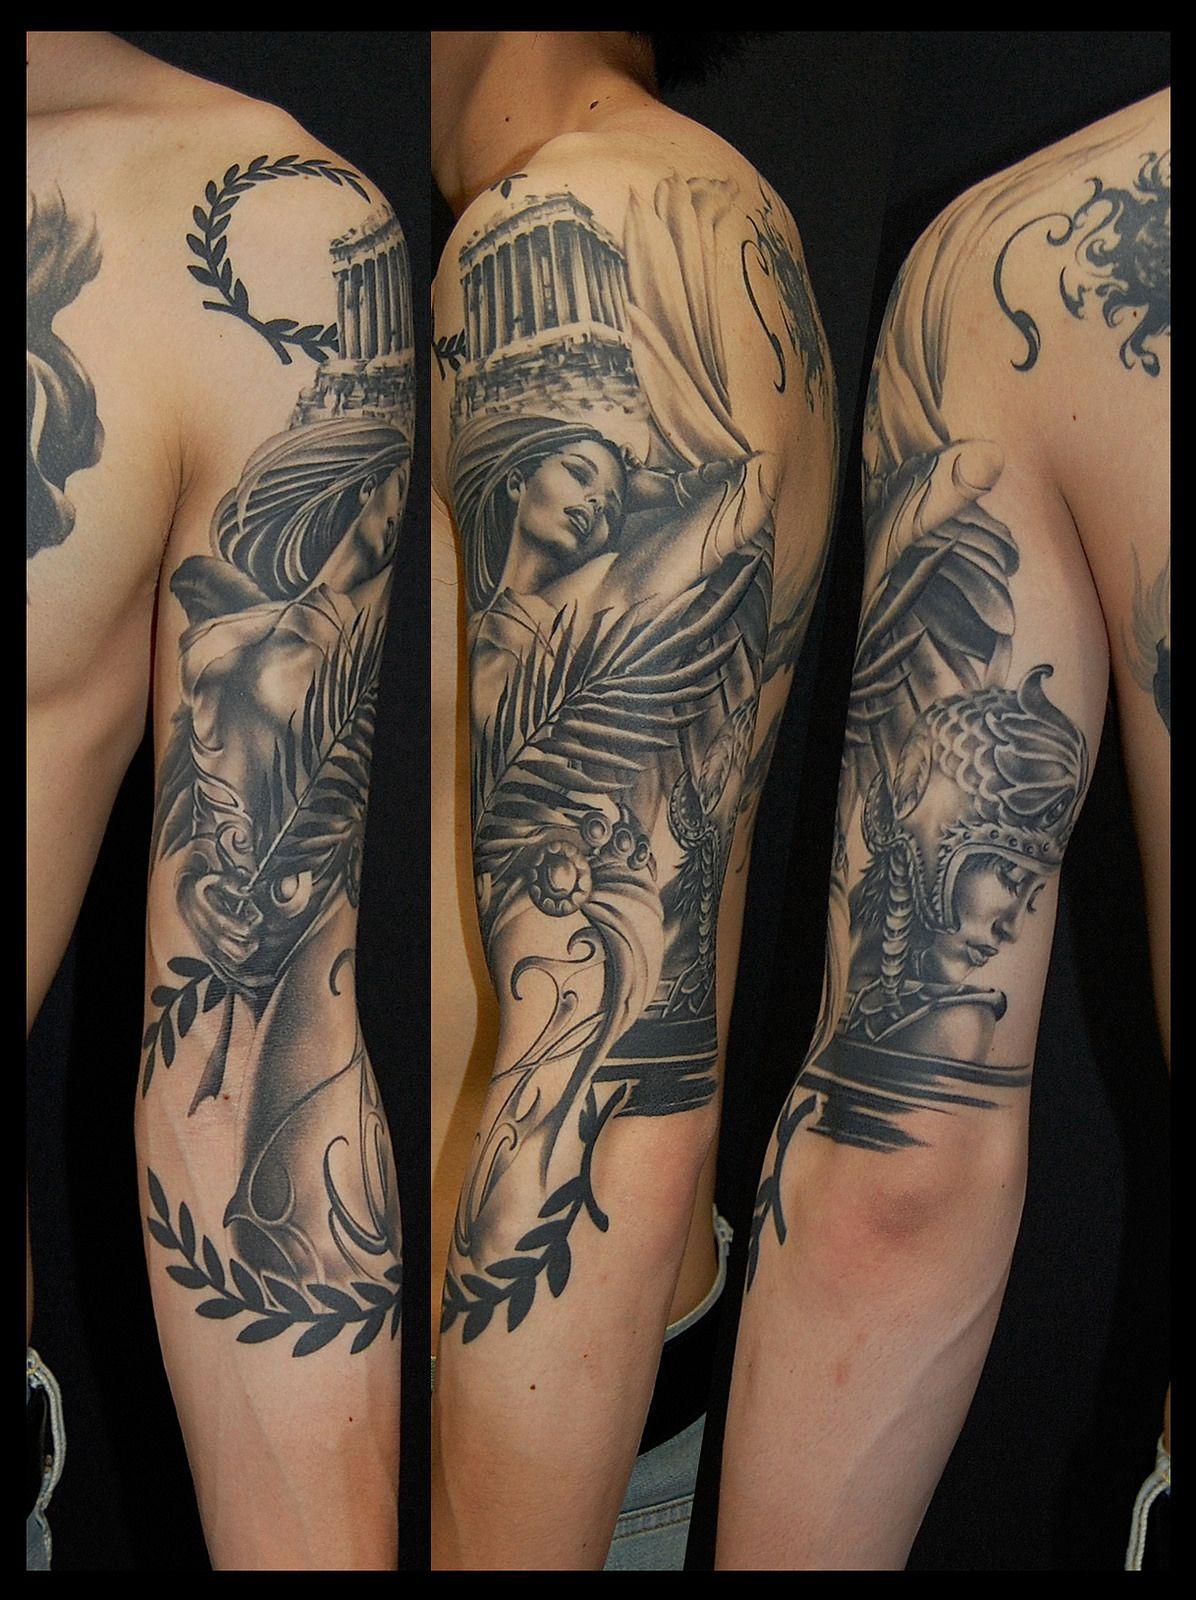 Tattoo Gallery Greek Mythology Tattoos Athena Tattoo Mythology Tattoos